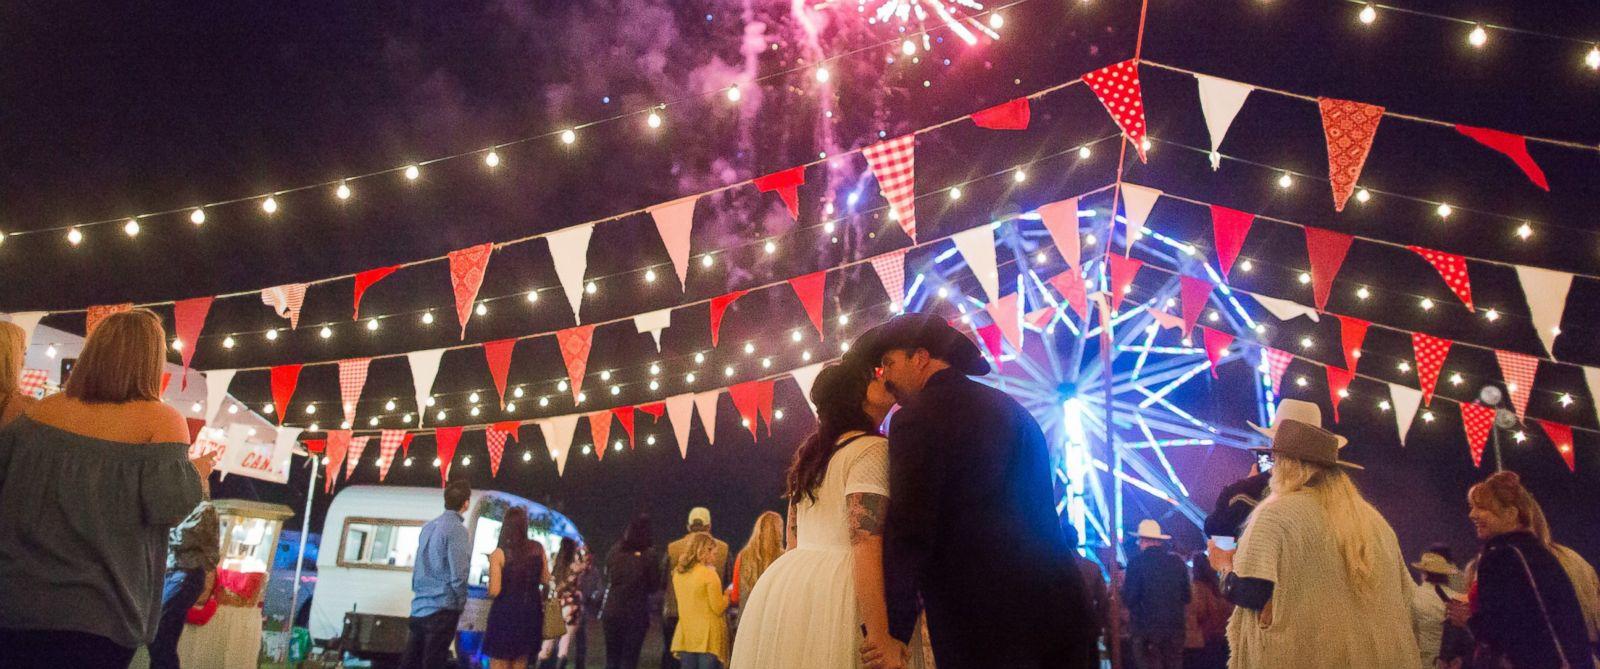 PHOTO: Evan and Melissa Tate, of Rockwall, Texas, threw an elaborate state fair-themed wedding on their familys 700-acre farm.